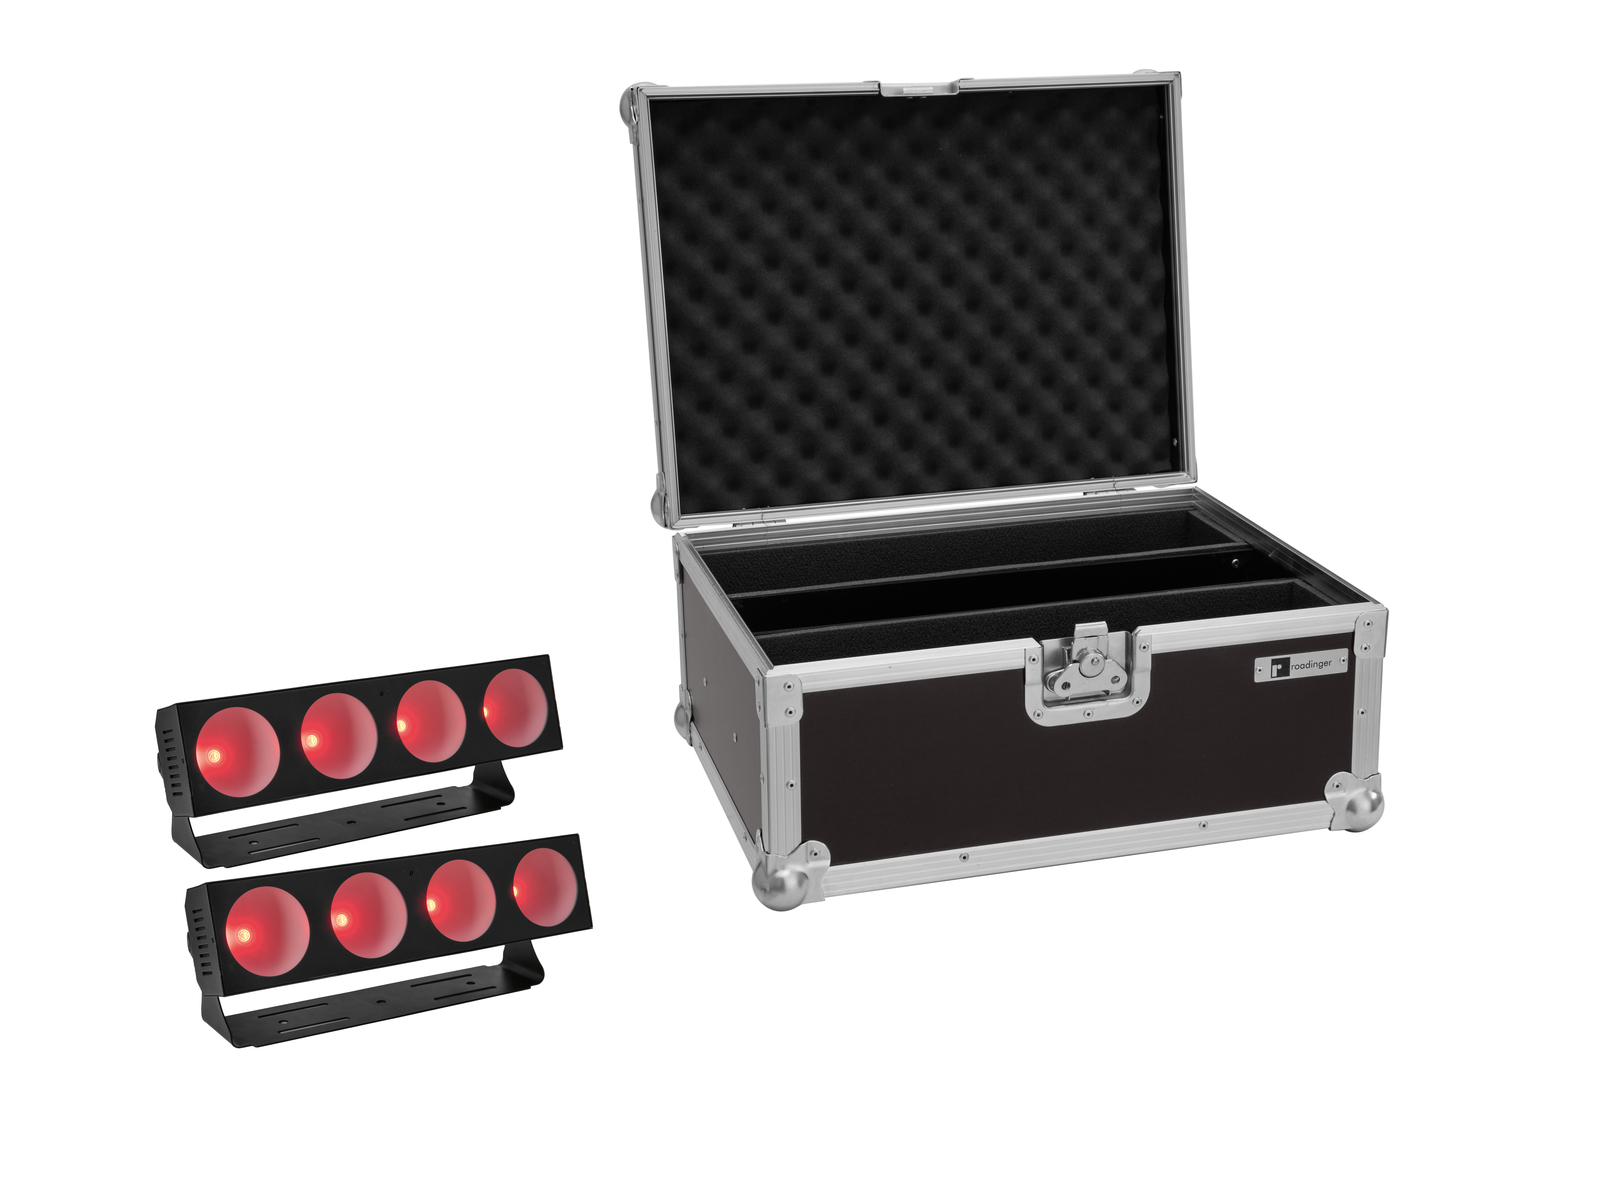 EUROLITE Set 2x LED CBB-4 COB RGB Leiste + Case